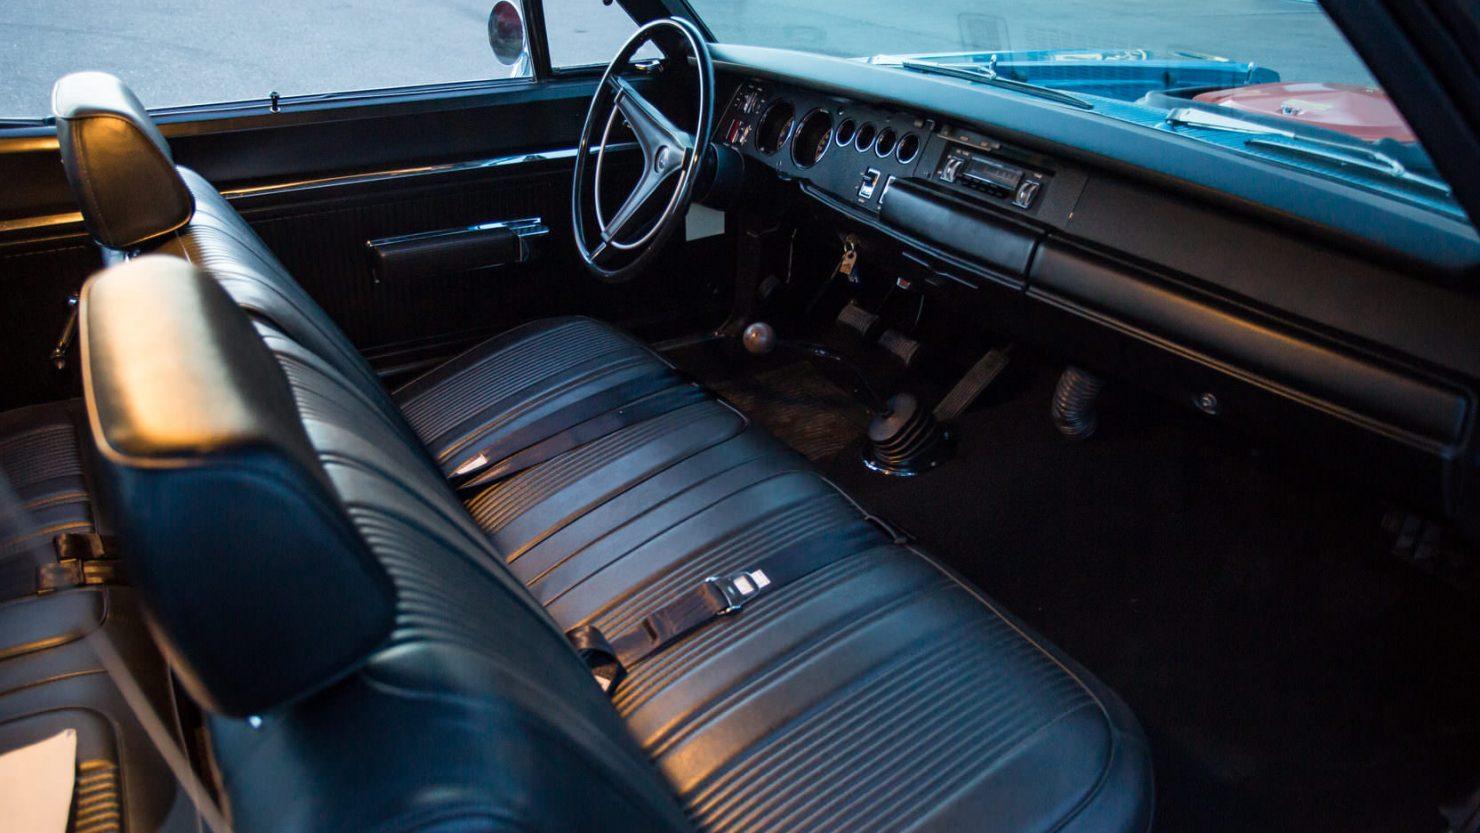 Dodge Super Bee 8 1480x833 - 1969 Dodge Super Bee 440 Six Pack